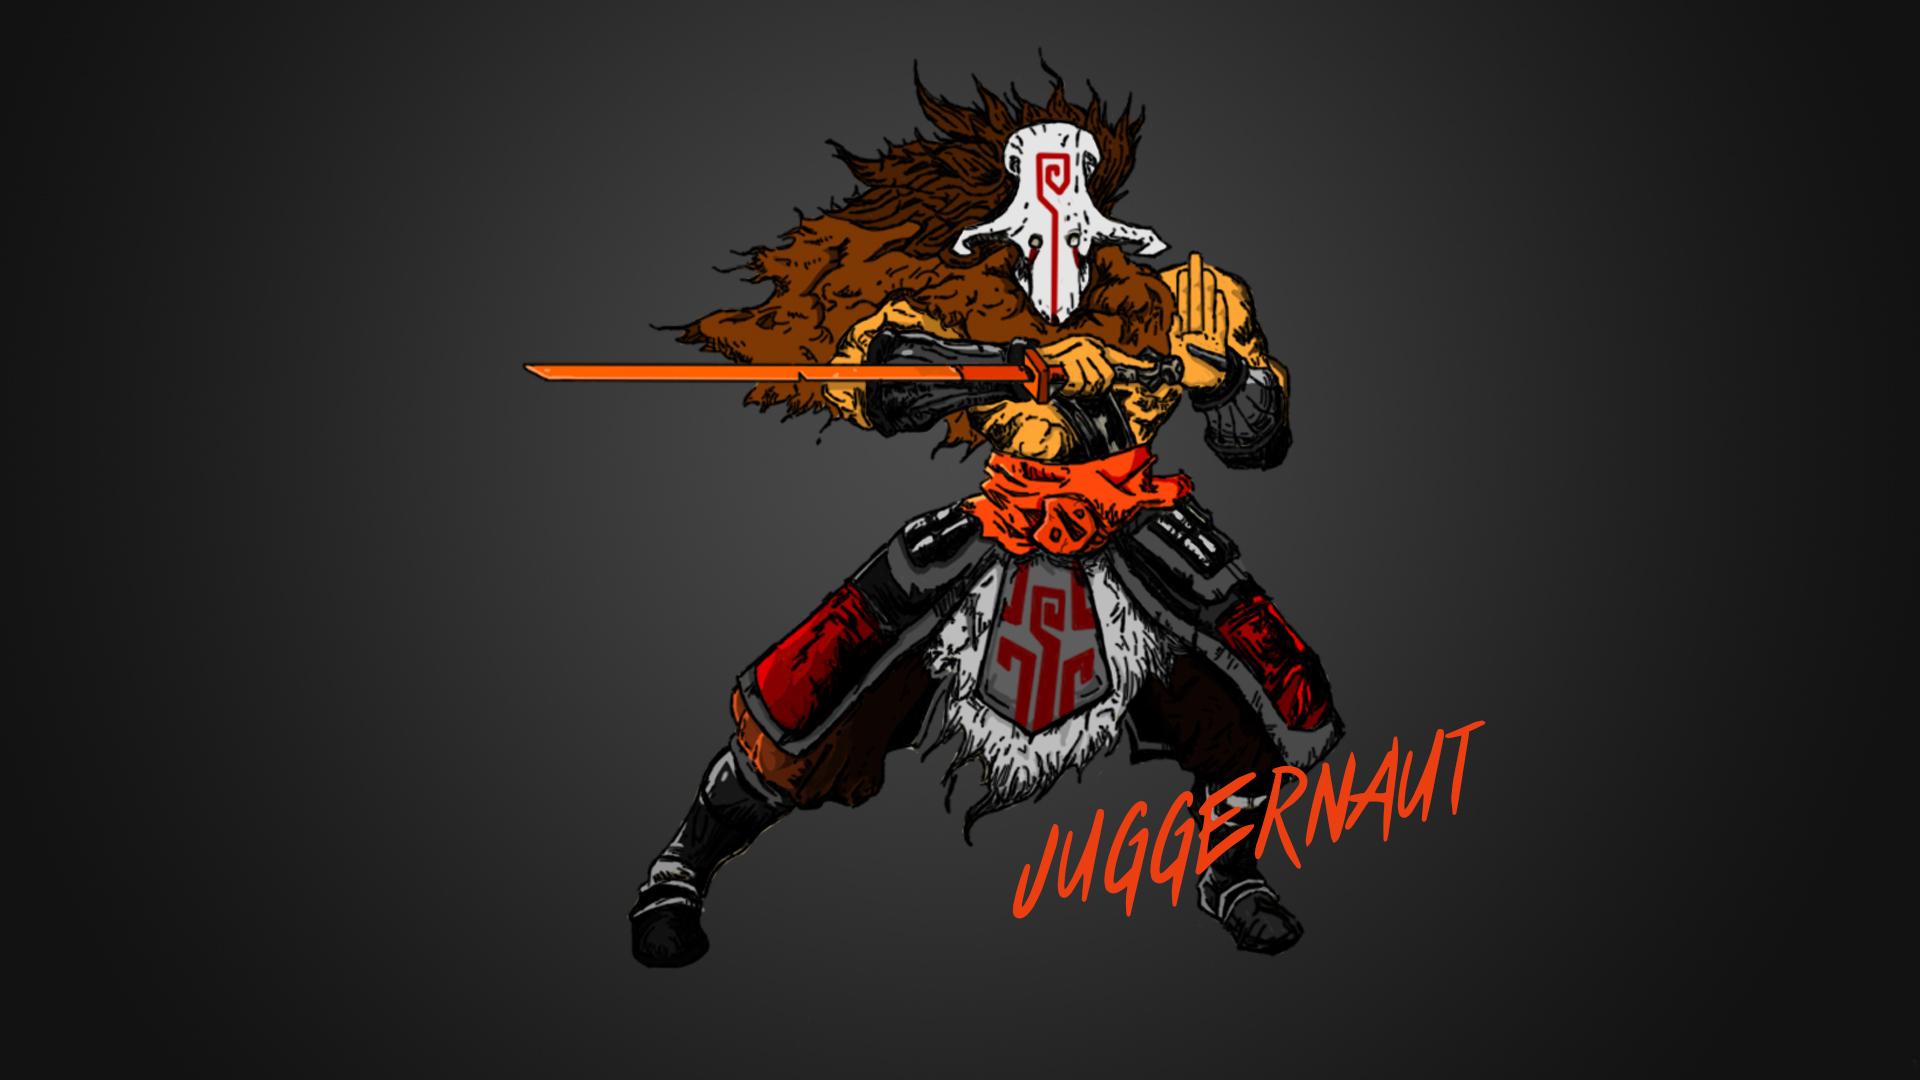 Juggernaut Dota 2 Wallpaper Hd Mount Mercy University